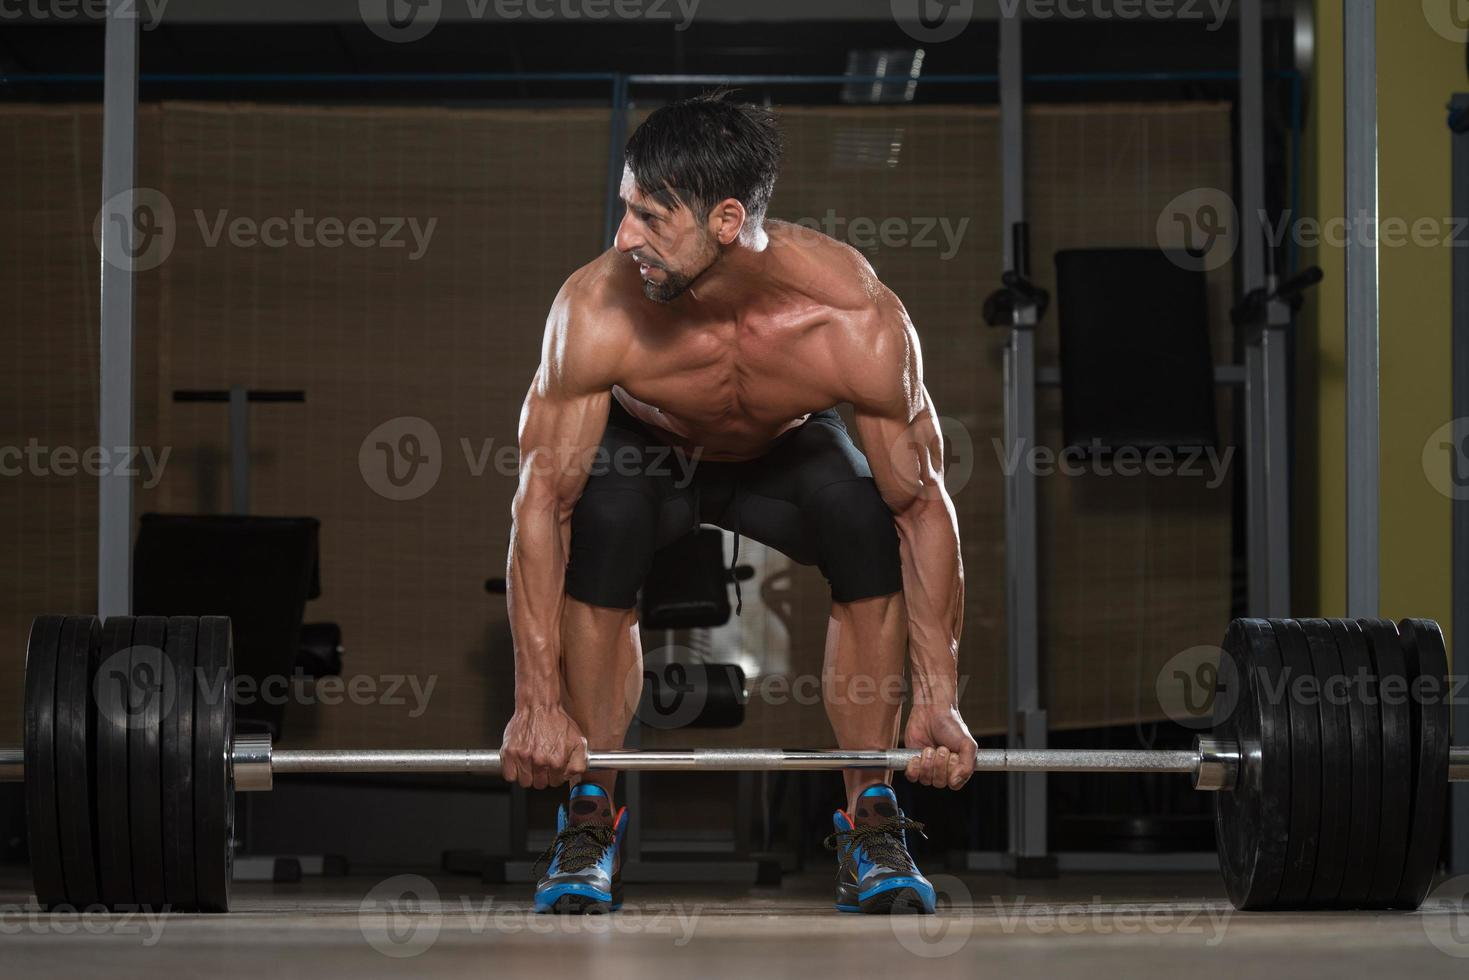 fisiculturista fazendo levantamento terra para as costas foto